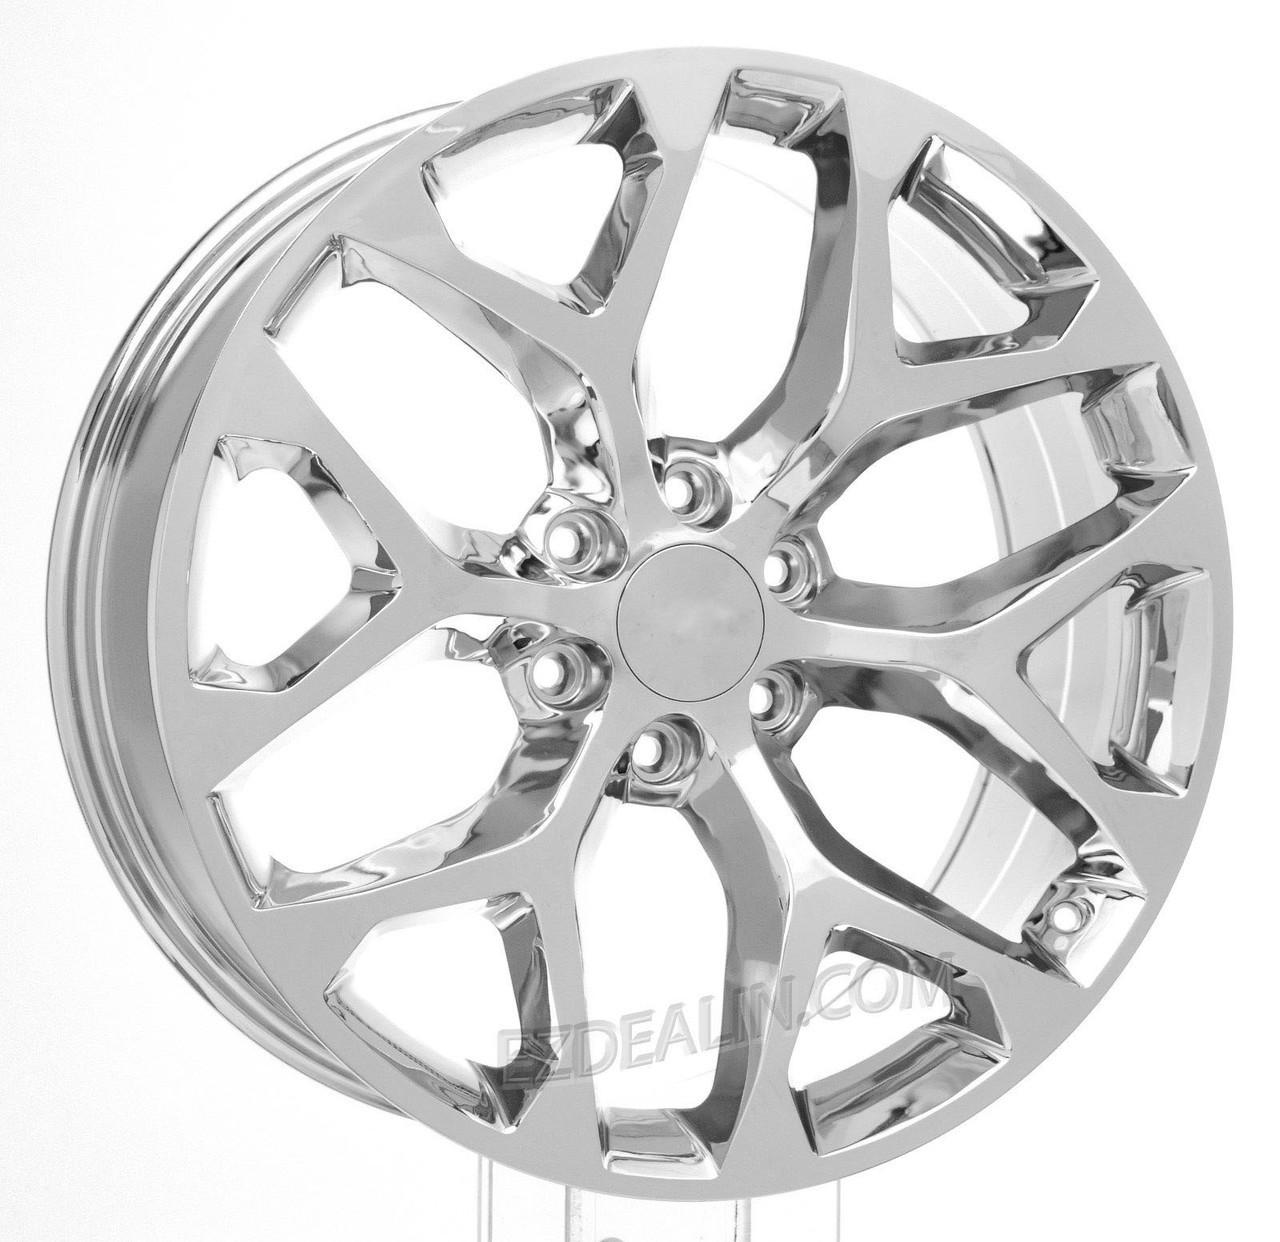 All Chevy chevy 22 inch rims : 22 inch Chrome Snowflake for Chevy Silverado, Tahoe, Suburban